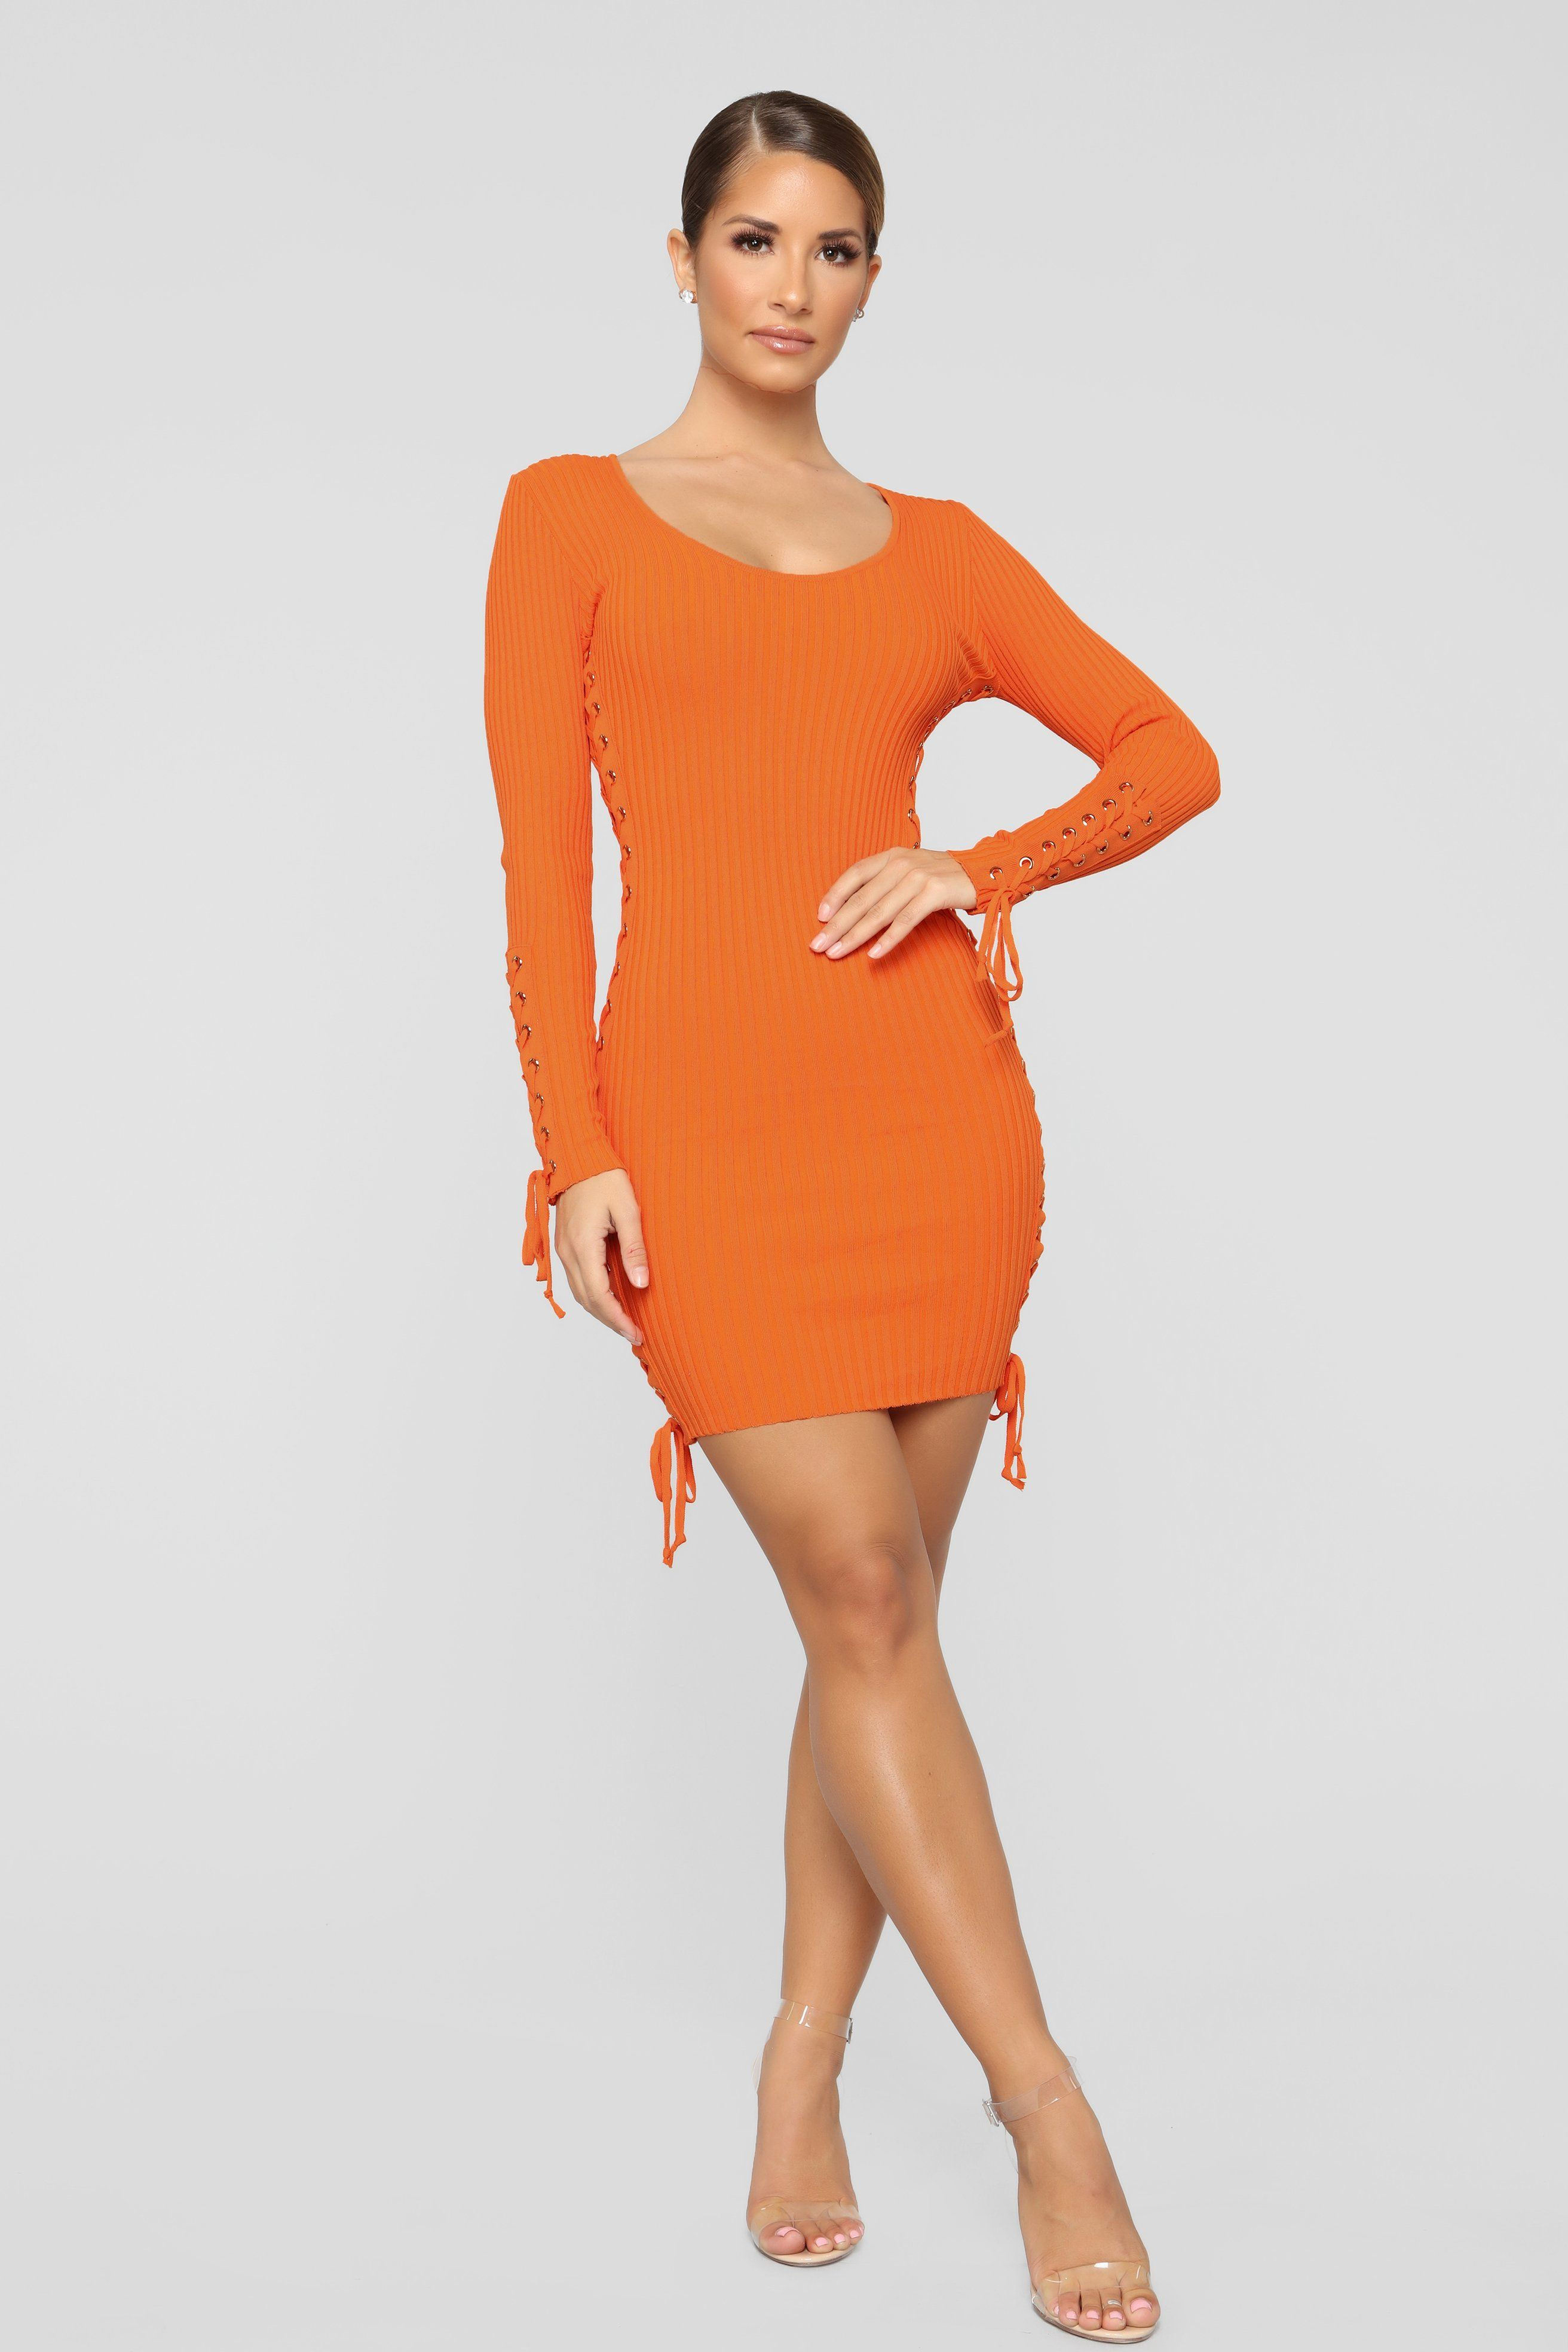 7eeefa50540 Pull Some Strings Sweater Dress - Orange in 2019